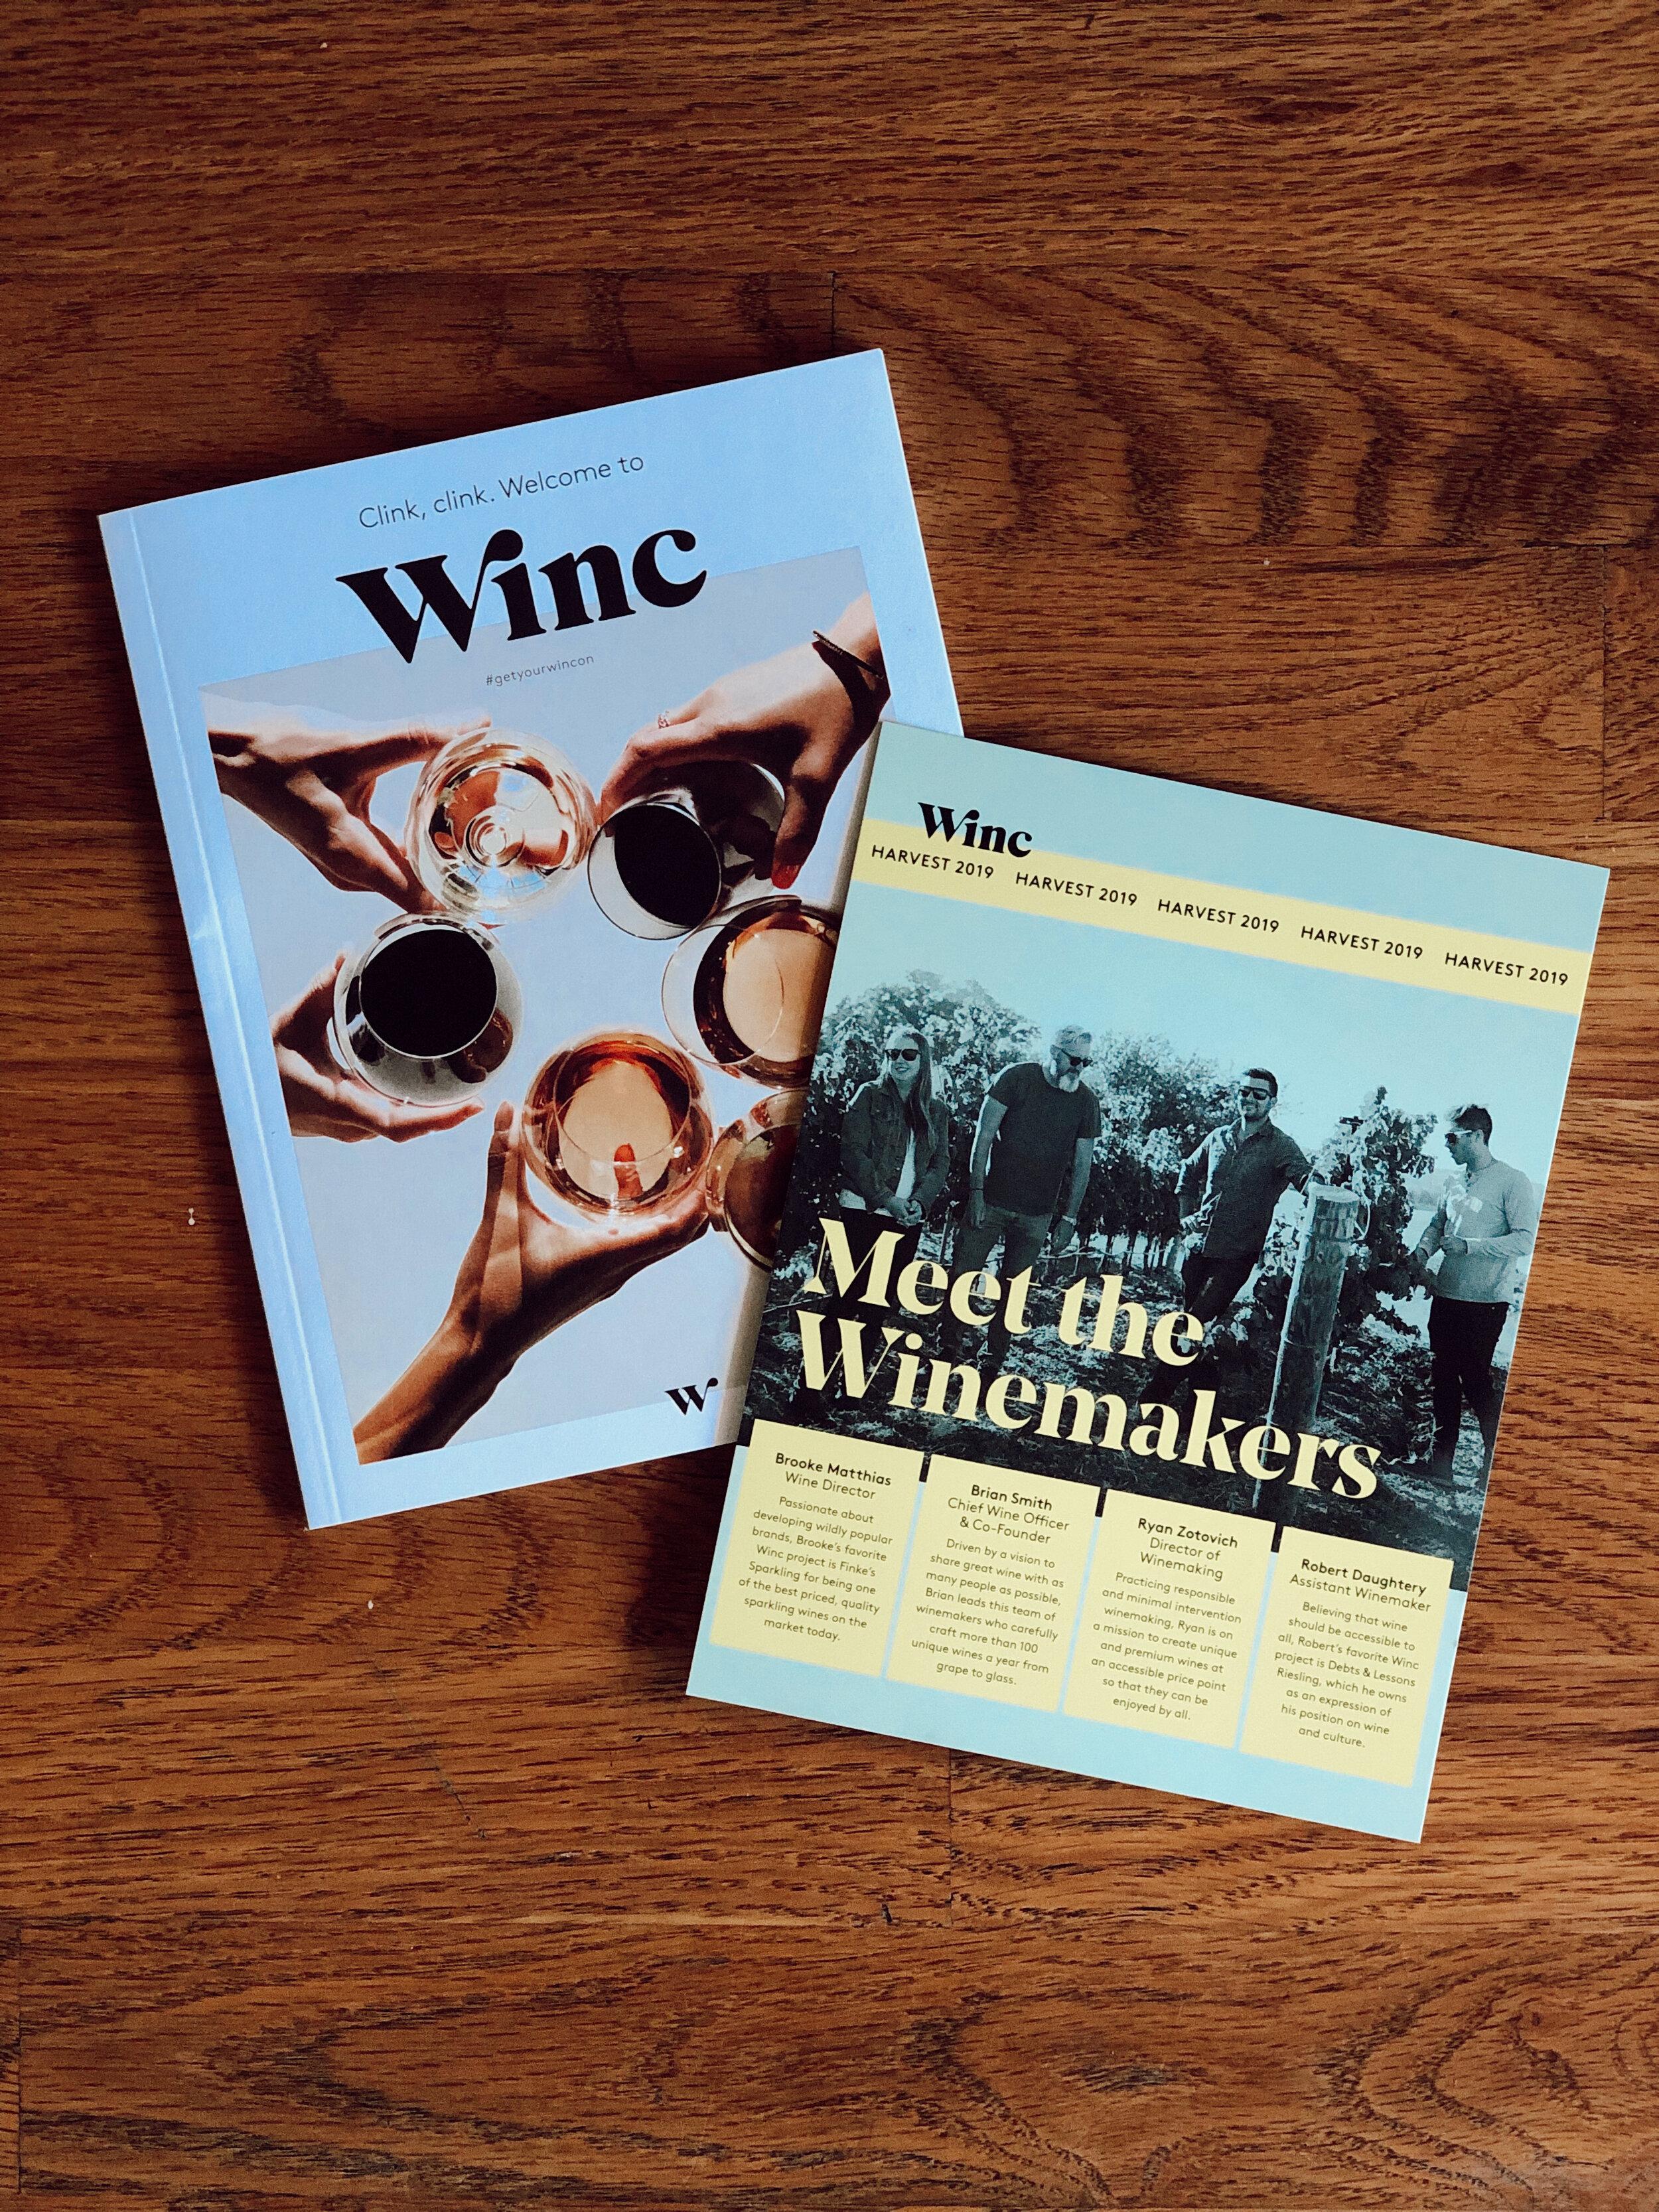 winc wine club